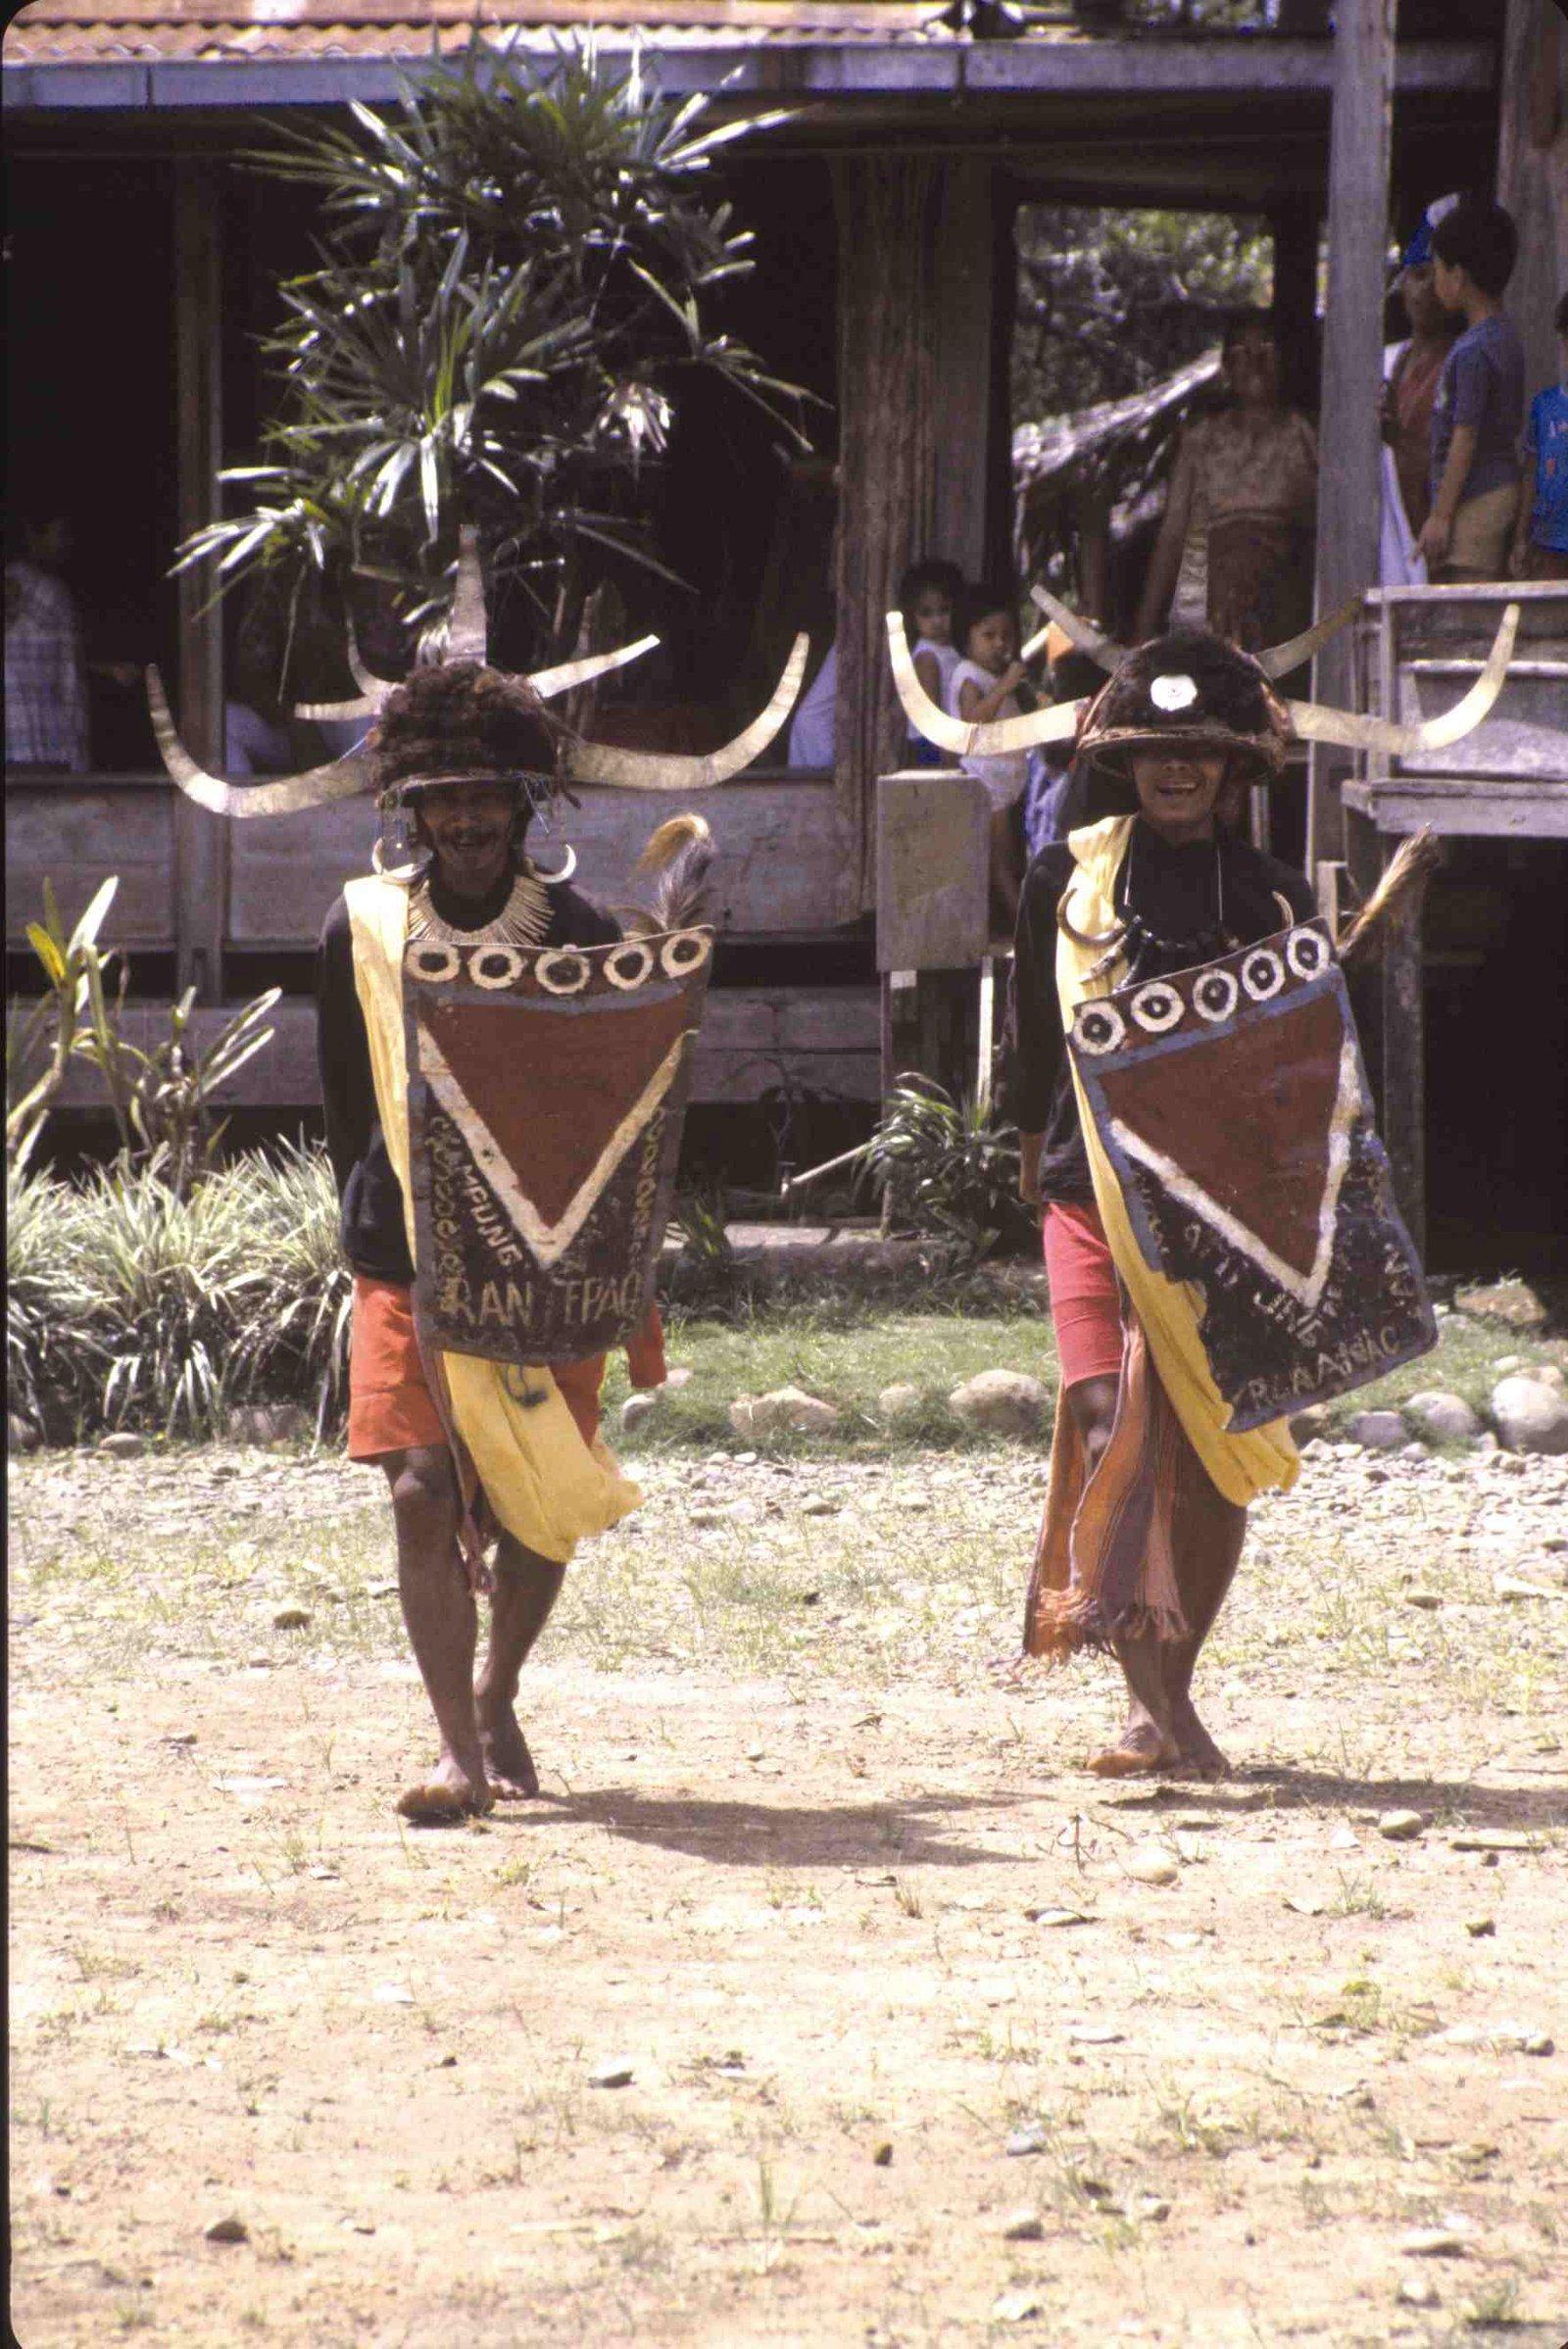 Toraja dancers perform a warrior dance